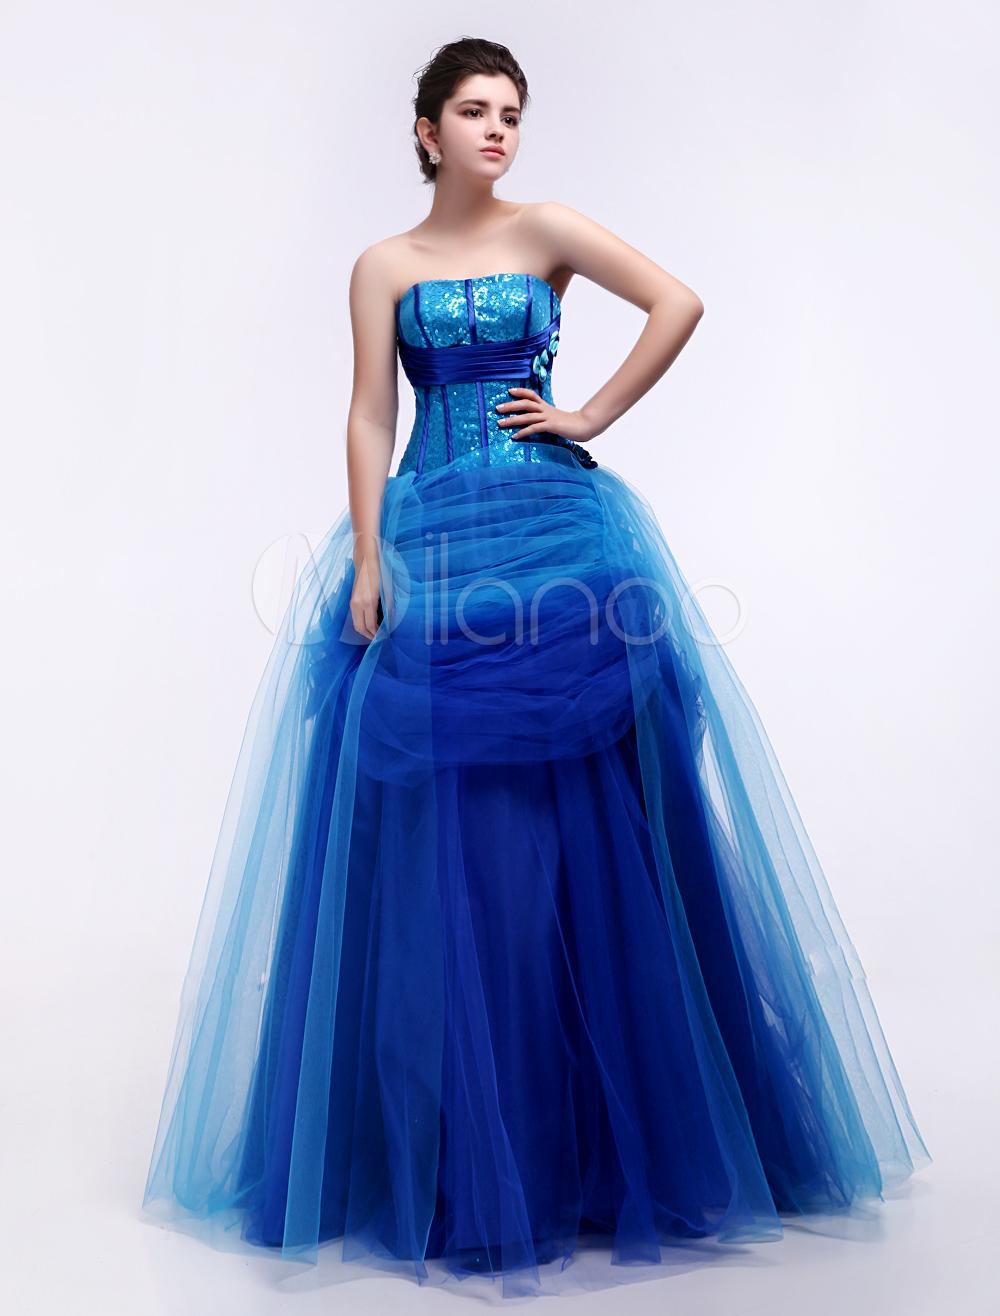 Blue Ball Gown Sweetheart Neck Quinceanera Dress